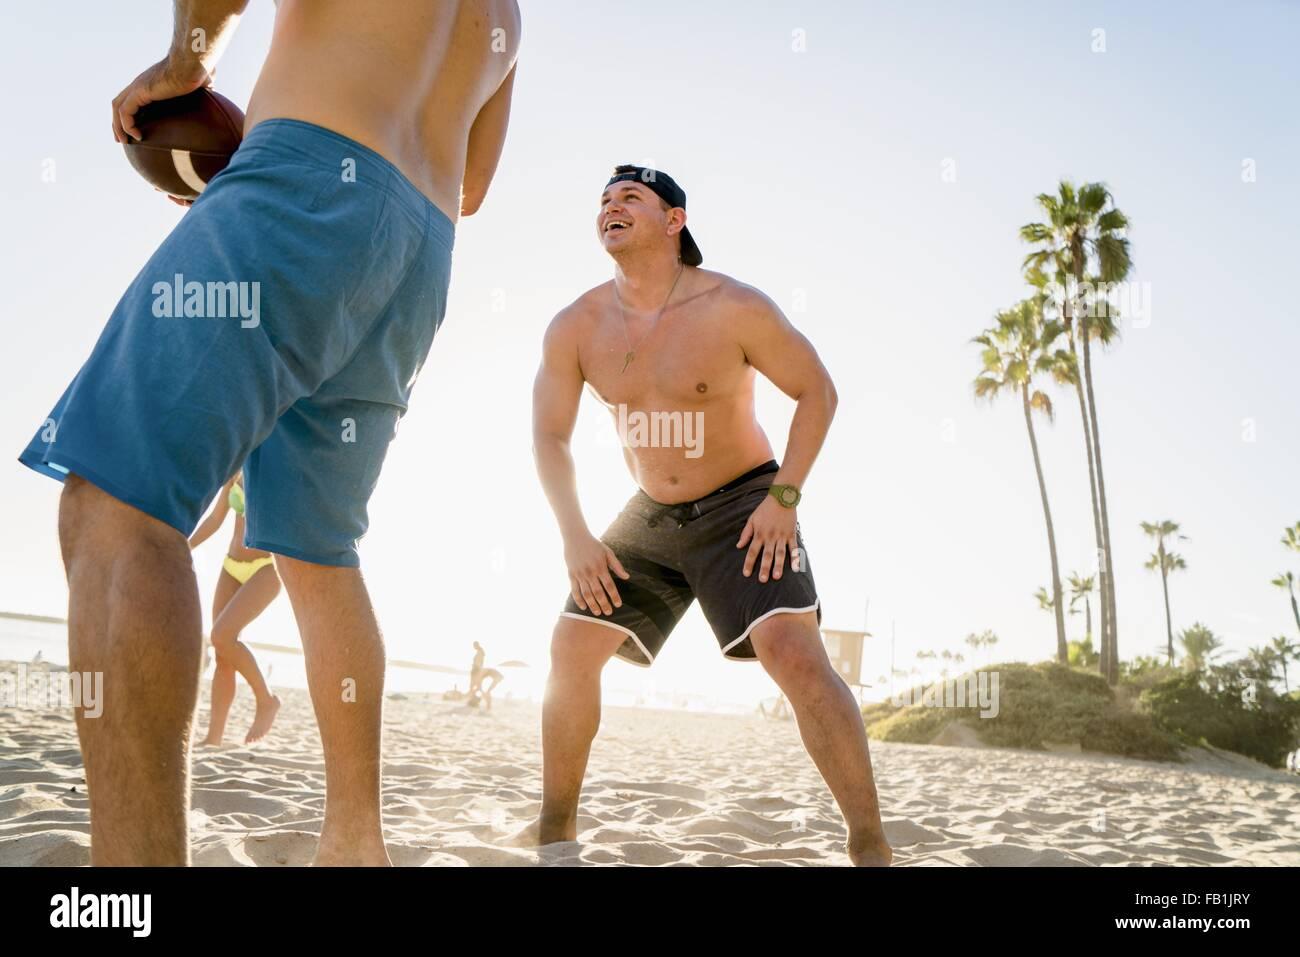 Les amis masculins et féminins au football sur Newport Beach, Californie, USA Photo Stock